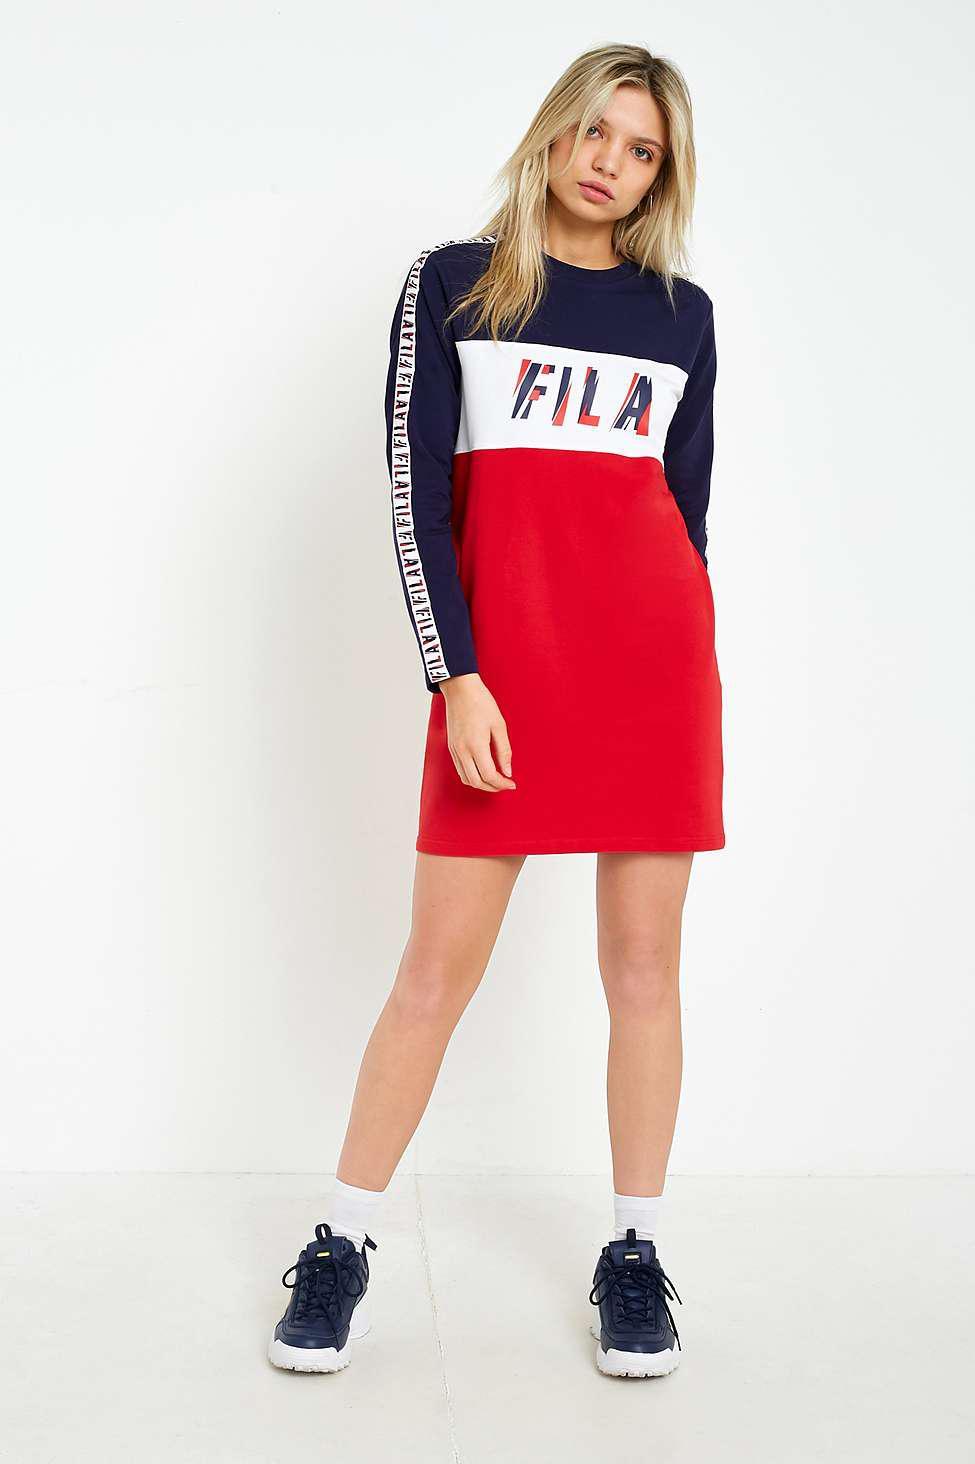 ea3aae8ecd1ac Fila Logo Taped Striped Long Sleeve T-shirt Dress - Womens L in Red ...